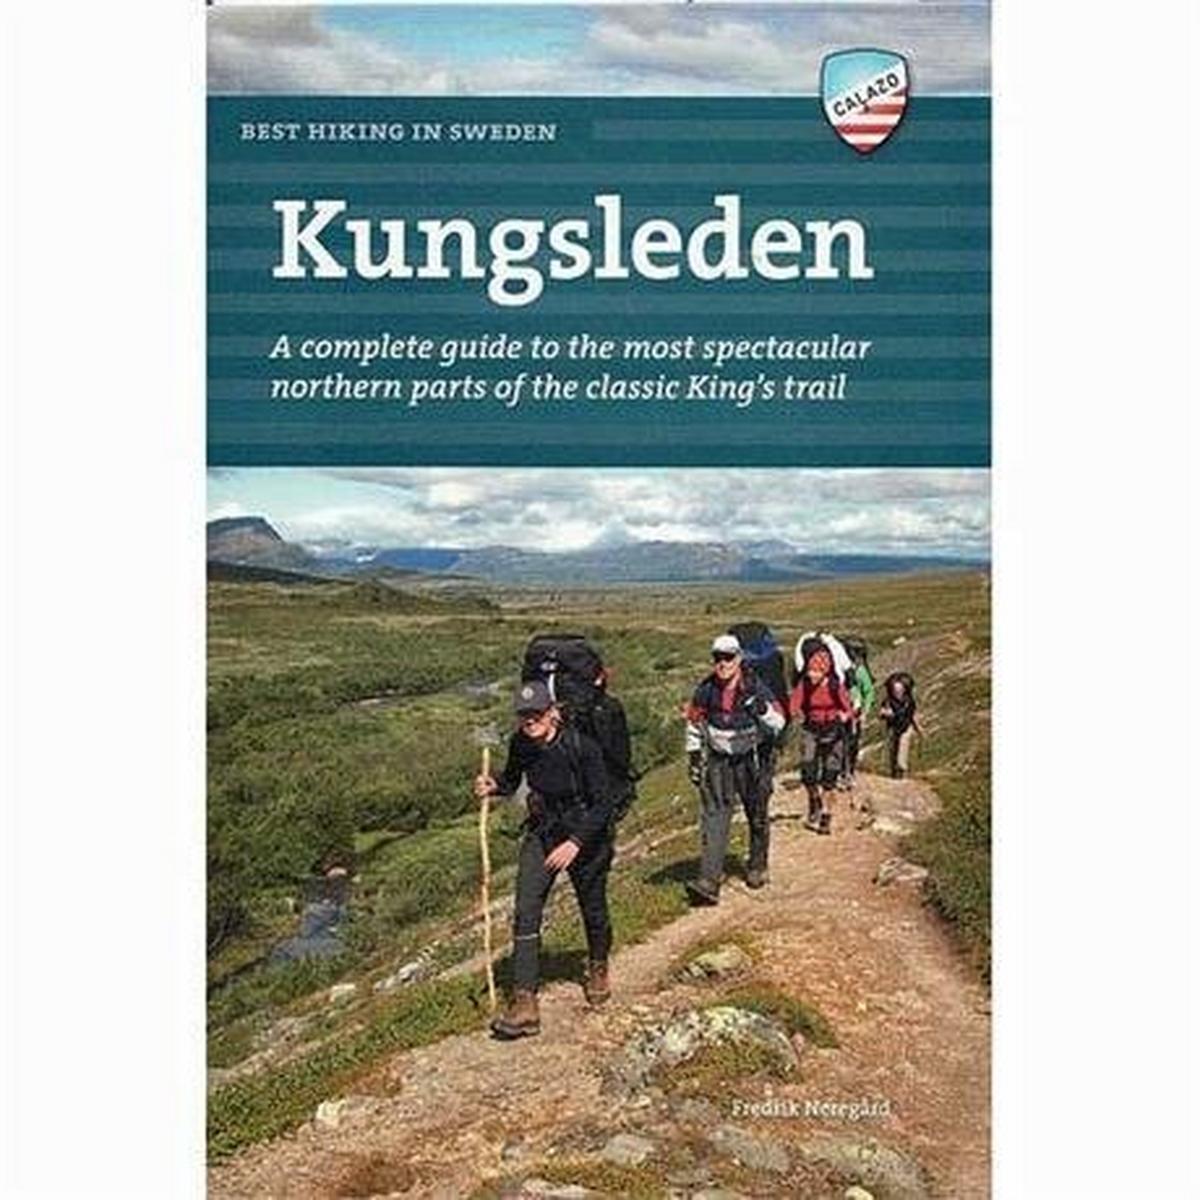 Miscellaneous Walking Guide Book: Best Hiking in Sweden - Kungsleden